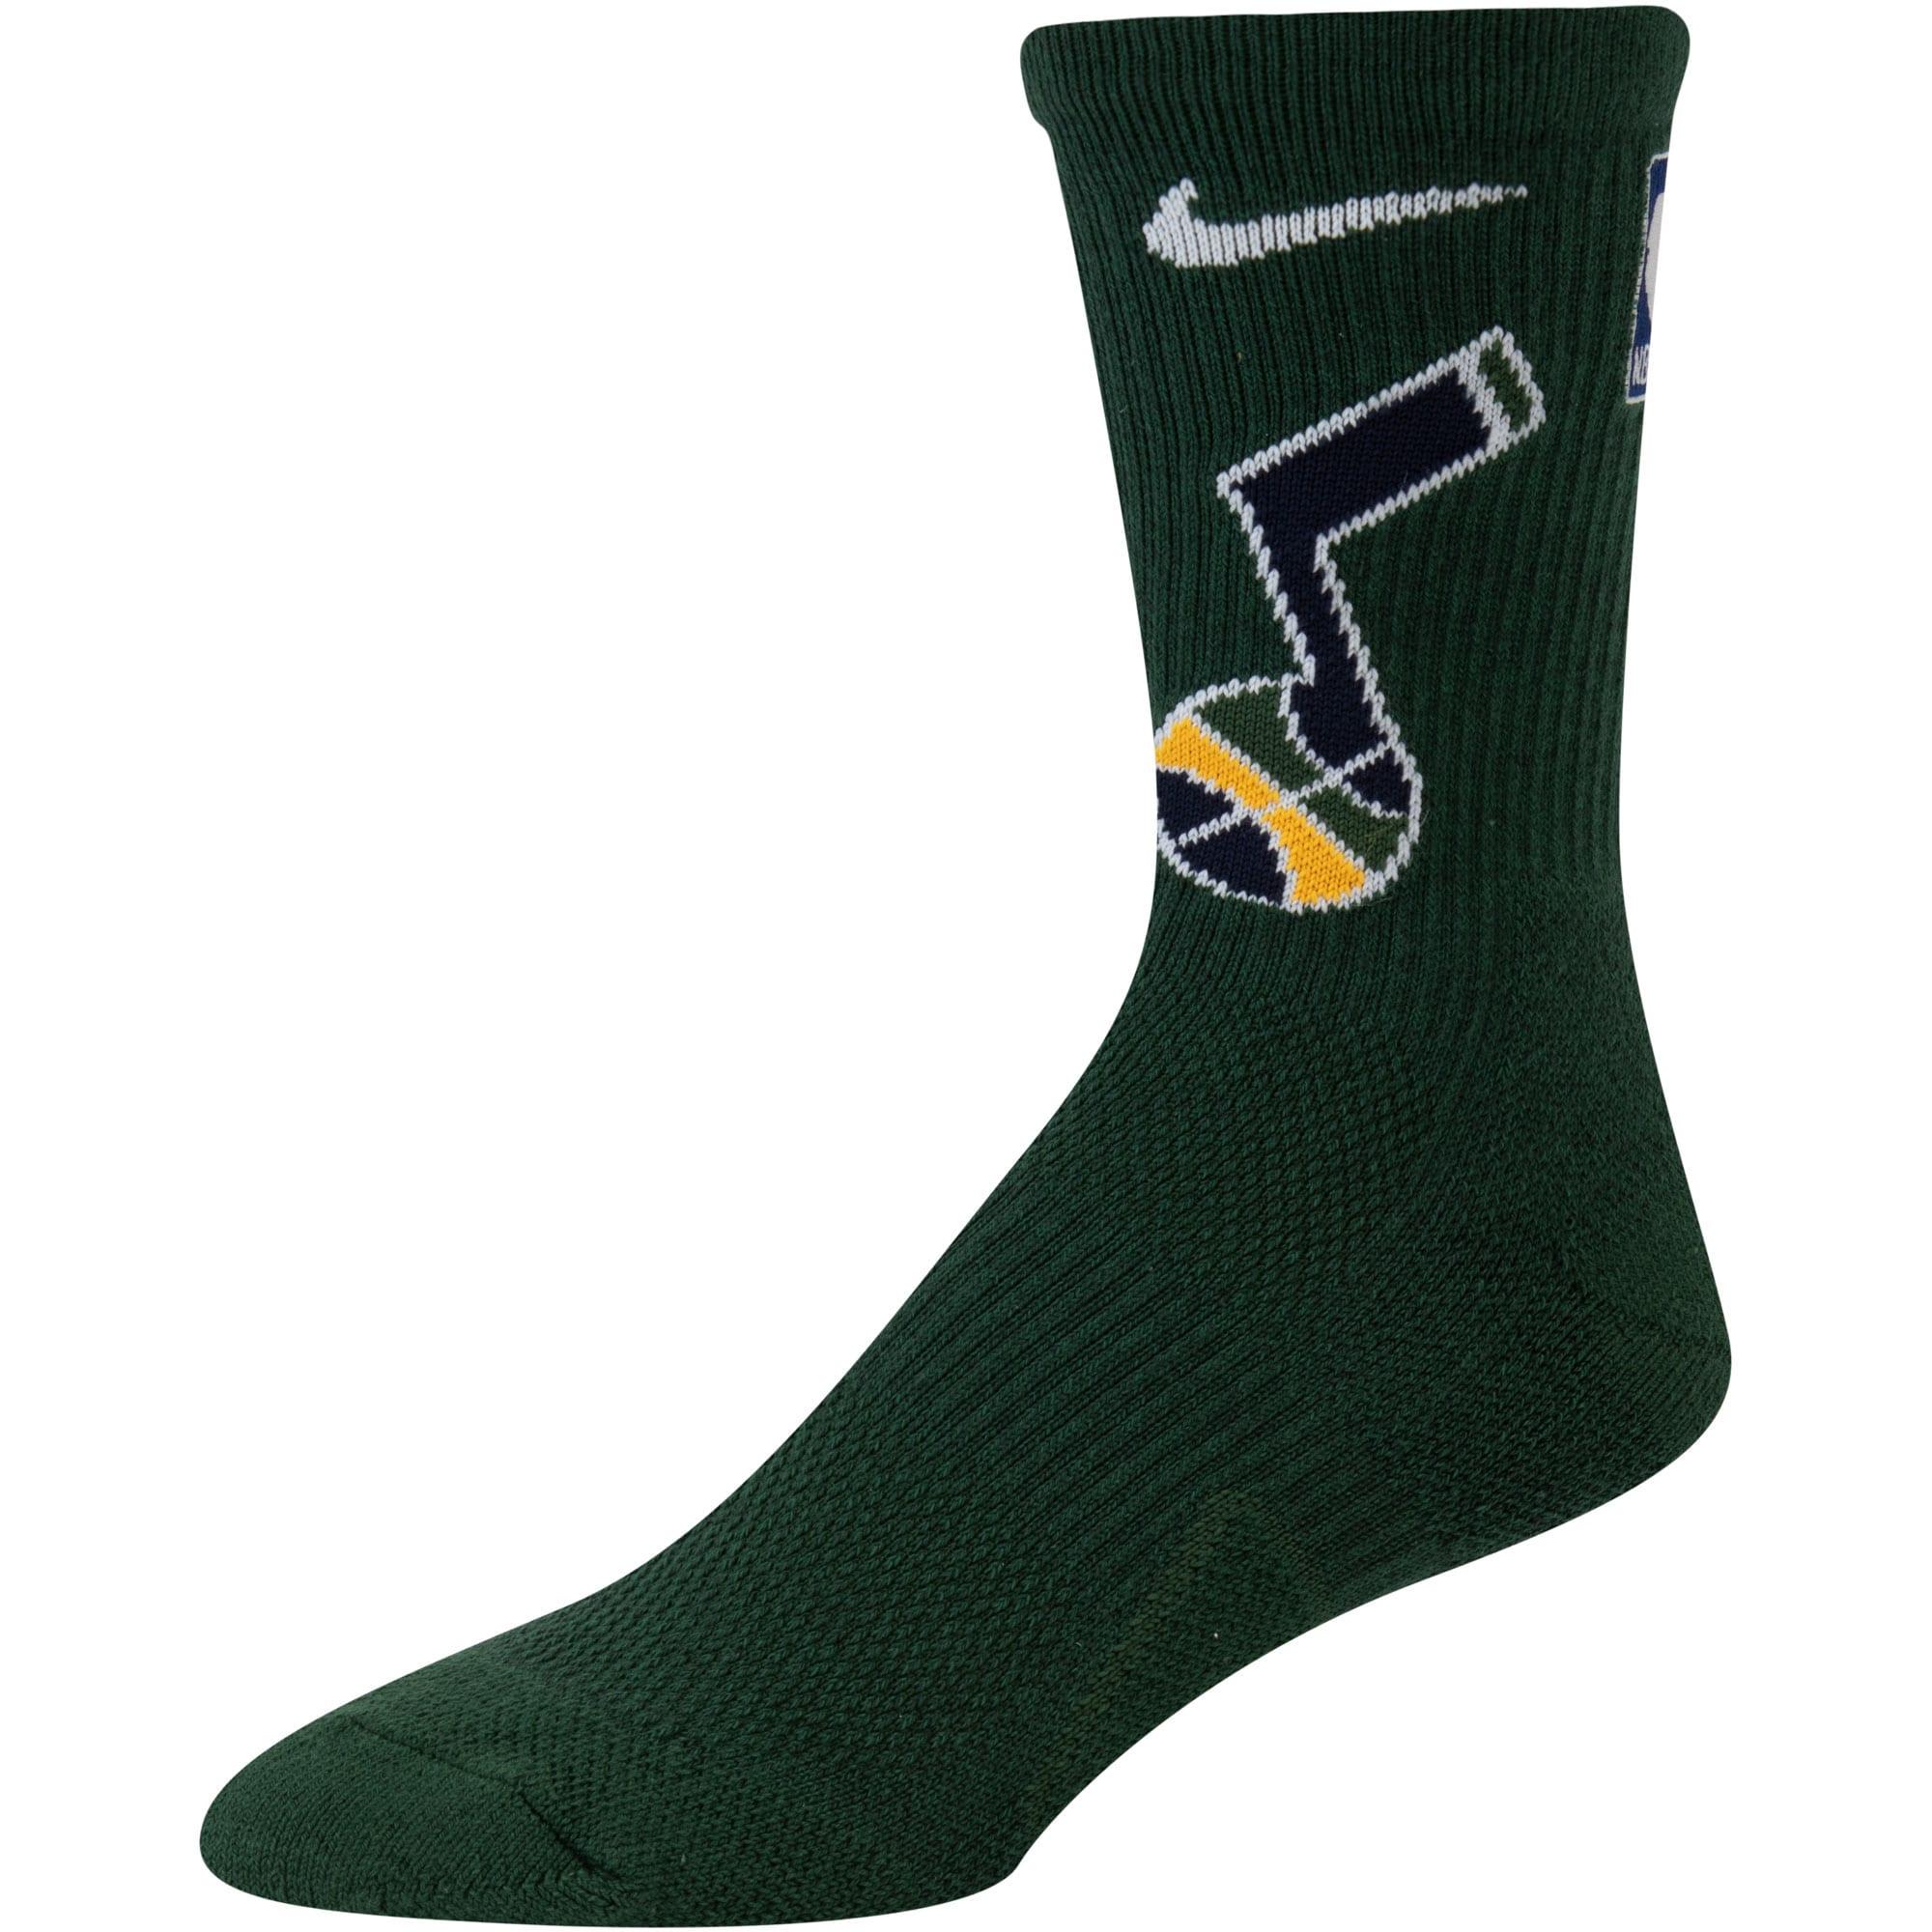 Utah Jazz Nike Elite Team Performance Crew Socks - Green